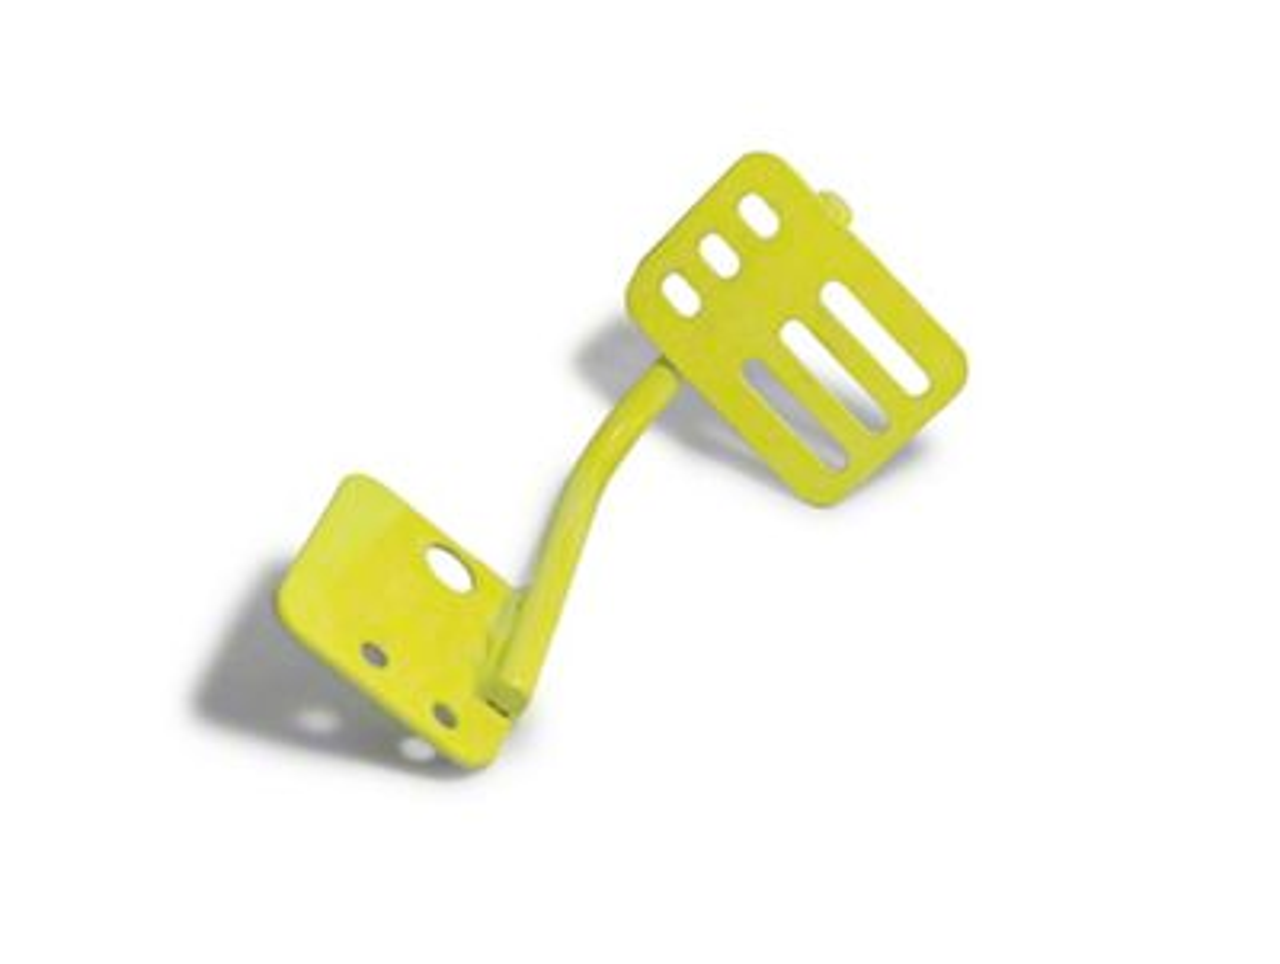 Steinjager Dead Pedal - Lemon Peel (07-18 Jeep Wrangler JK)